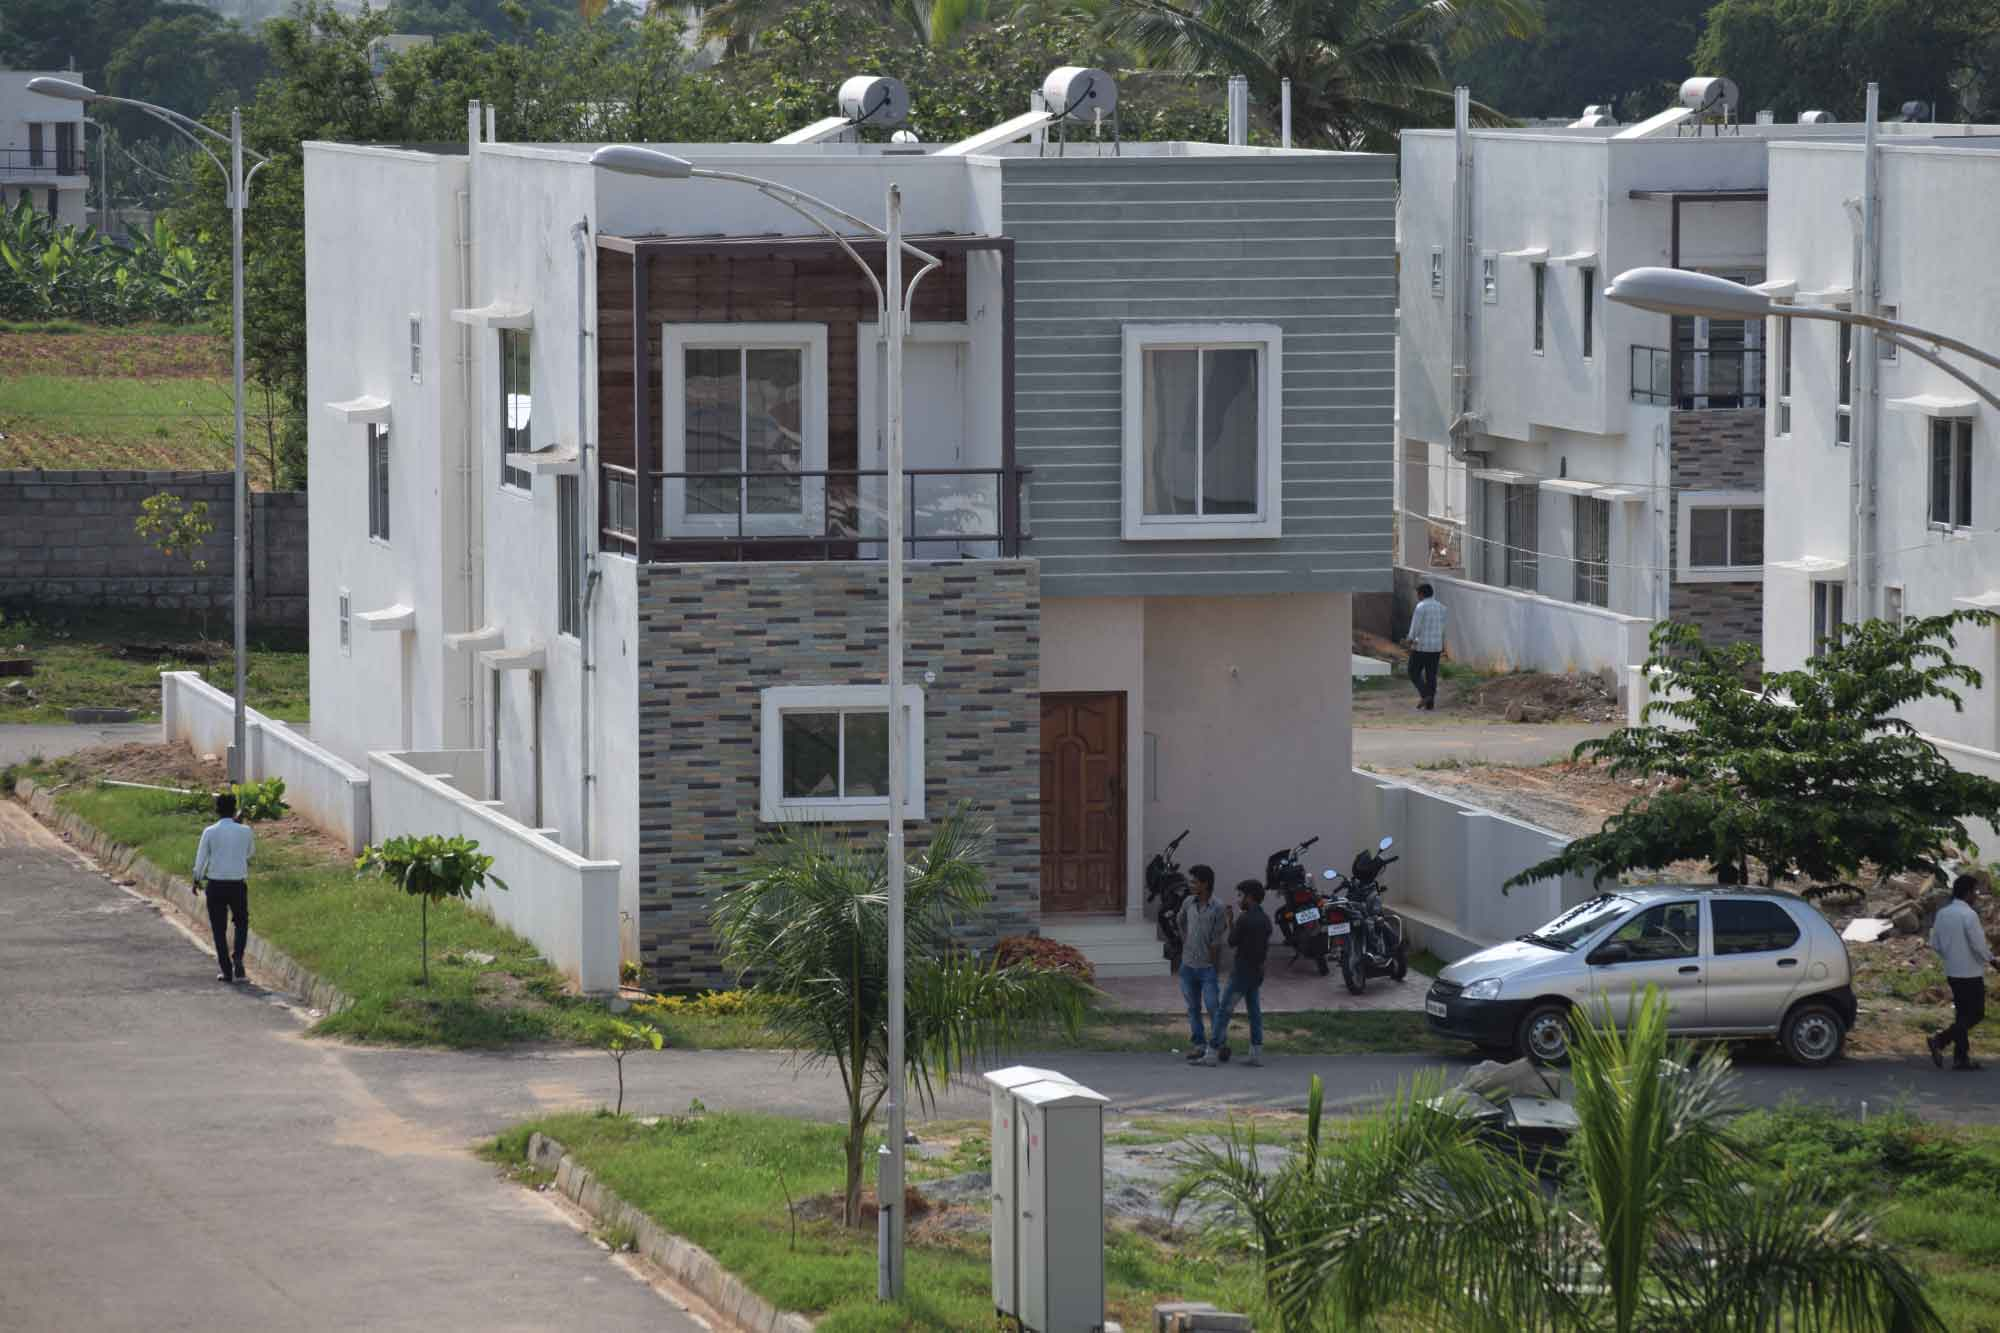 Artha Reviera Villa Marsur Bangalore 10841